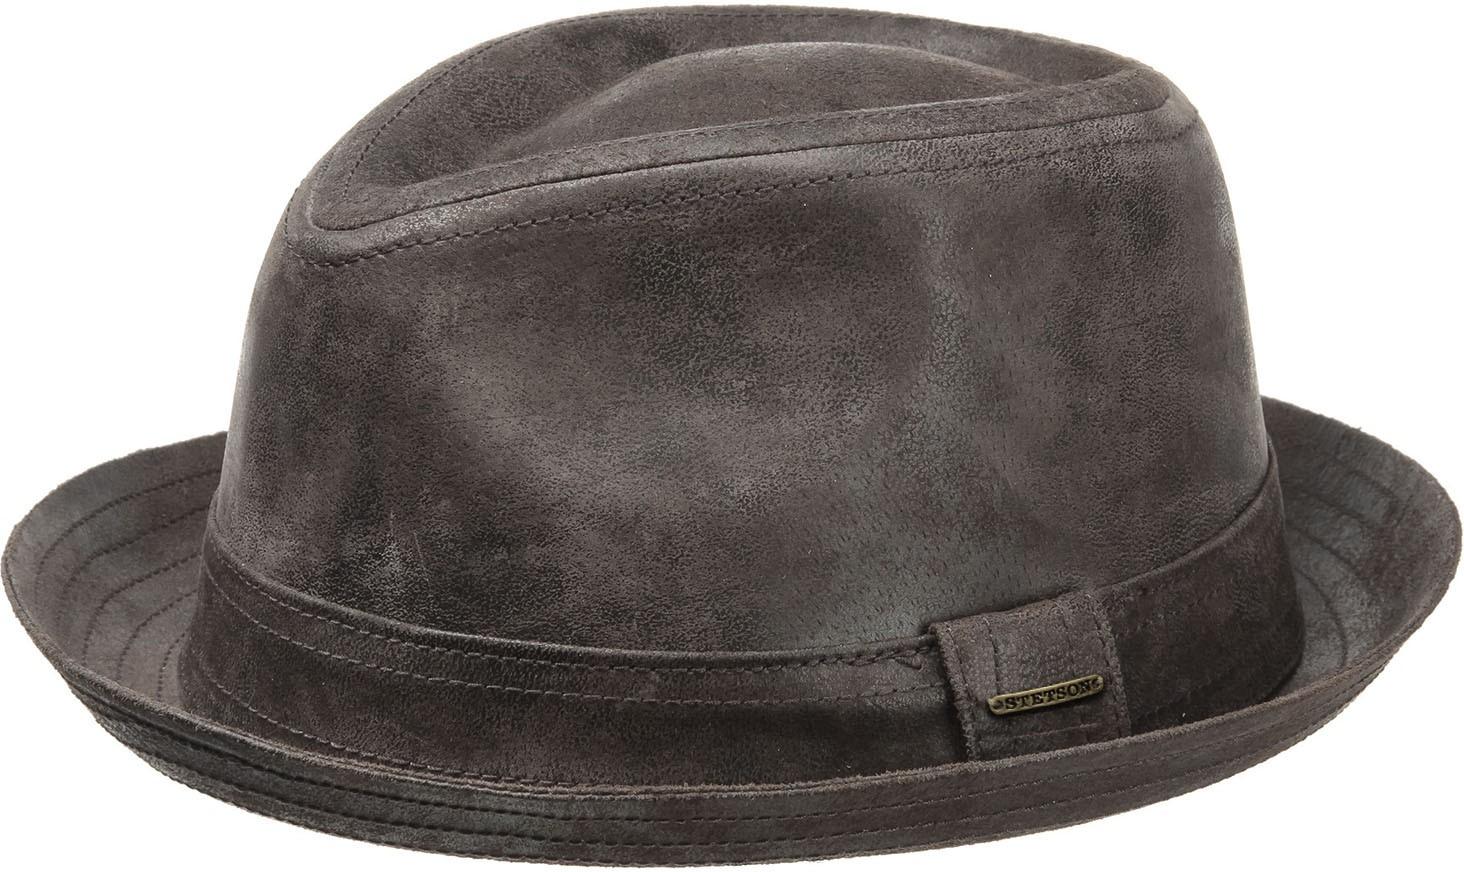 Porkpie Hat Stetson Radcliff - Pingleton Hats e3887b1b883